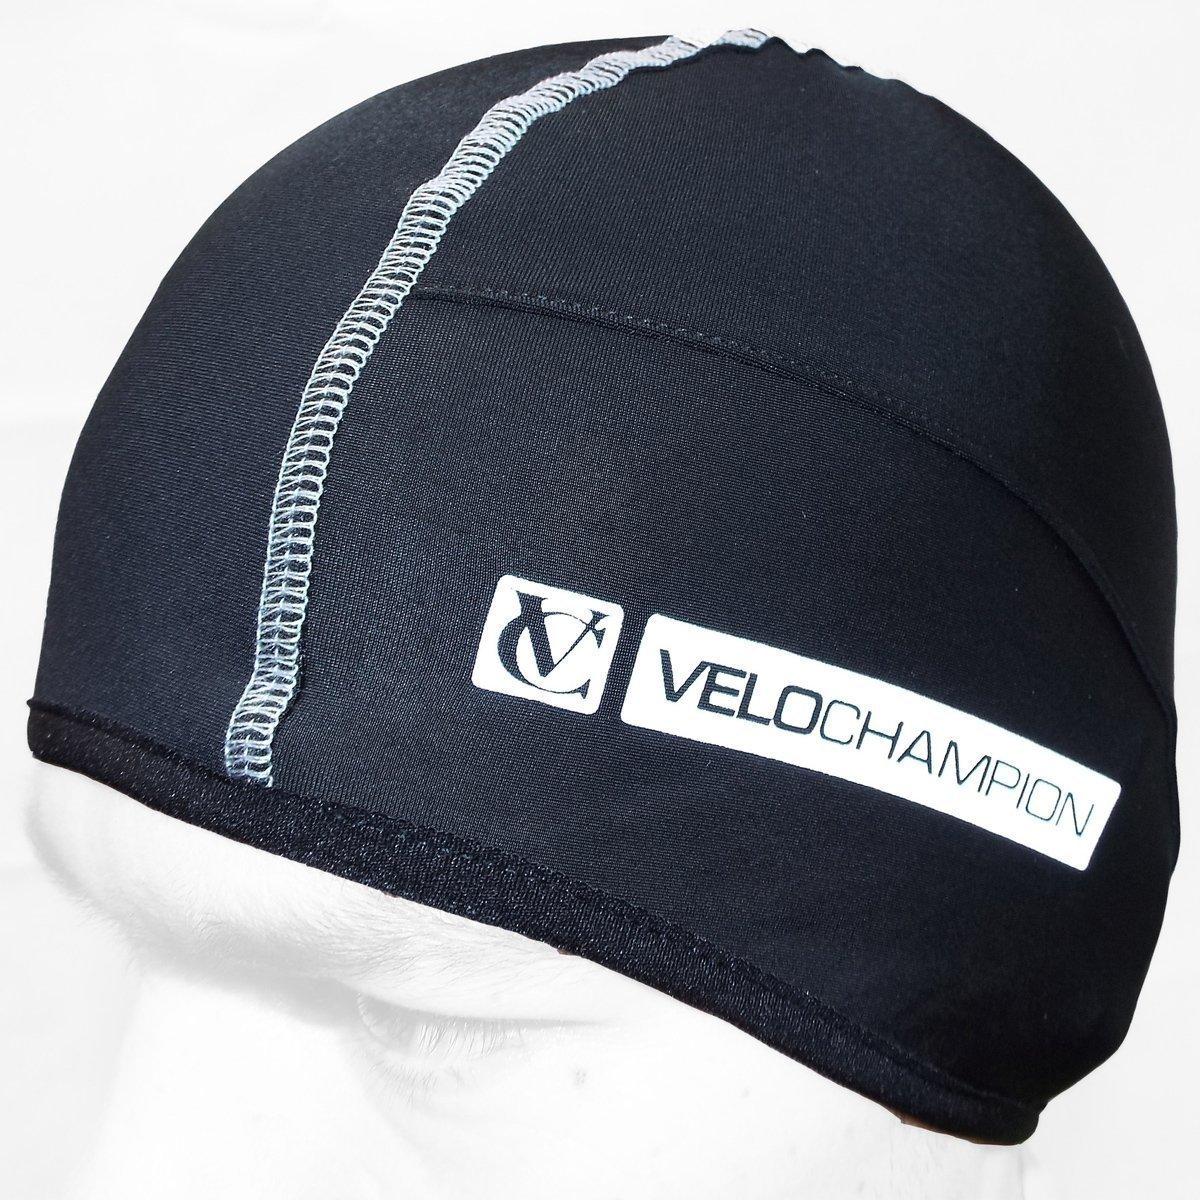 2f4fc9bf6b7 Get Quotations · VeloChampion Thermo Tech Cycling Skull Cap - Under Helmet  Hat - Black